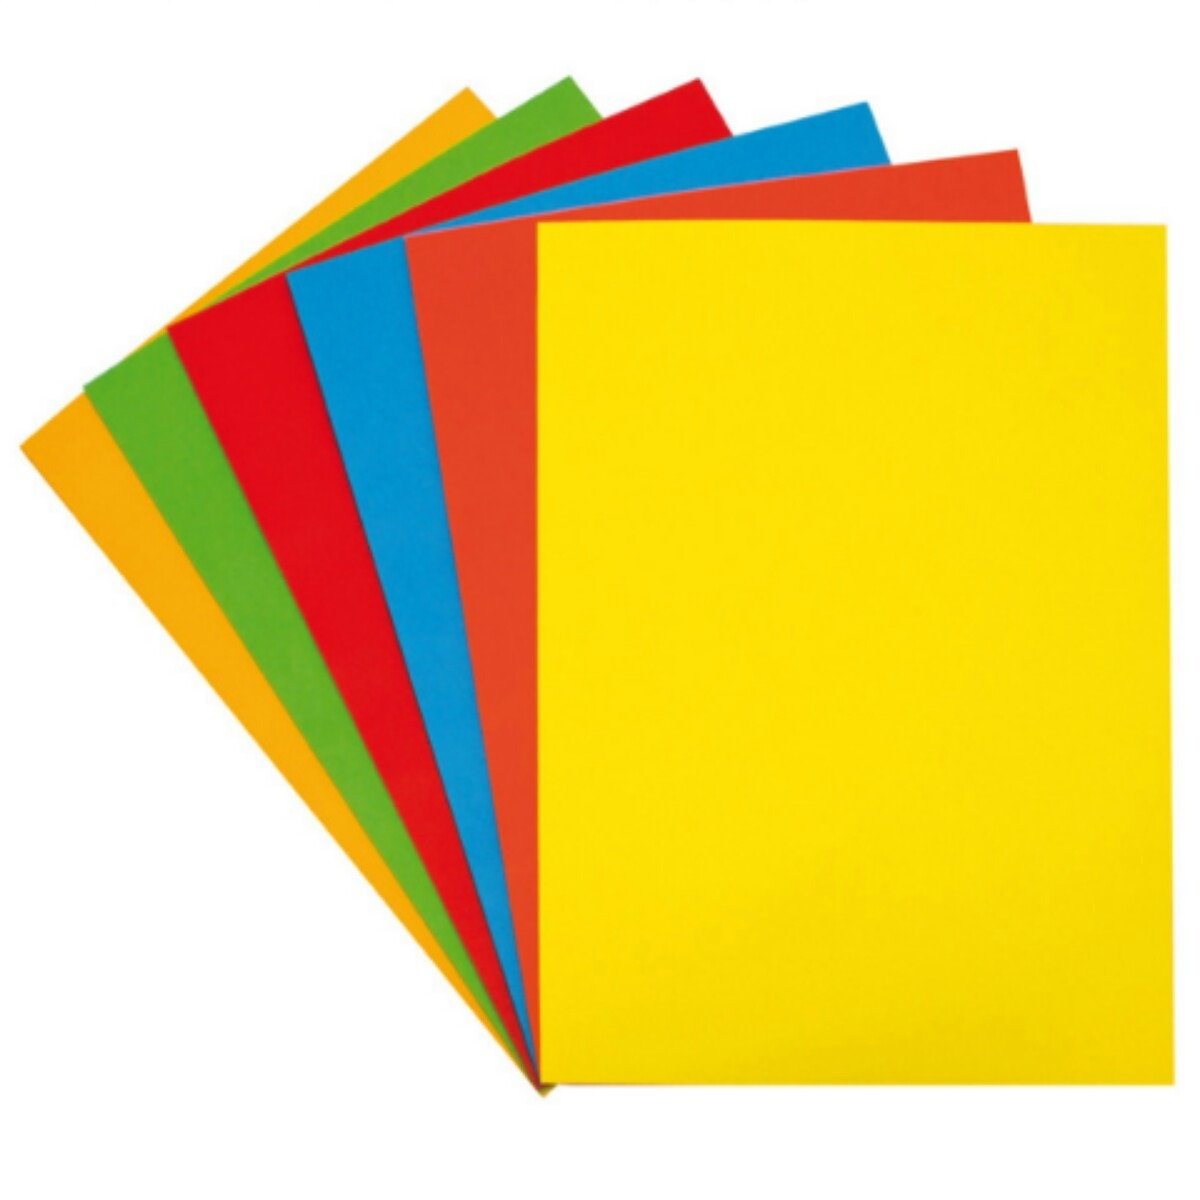 30 Hojas De Colores Tamaño Carta Madi E Commerce